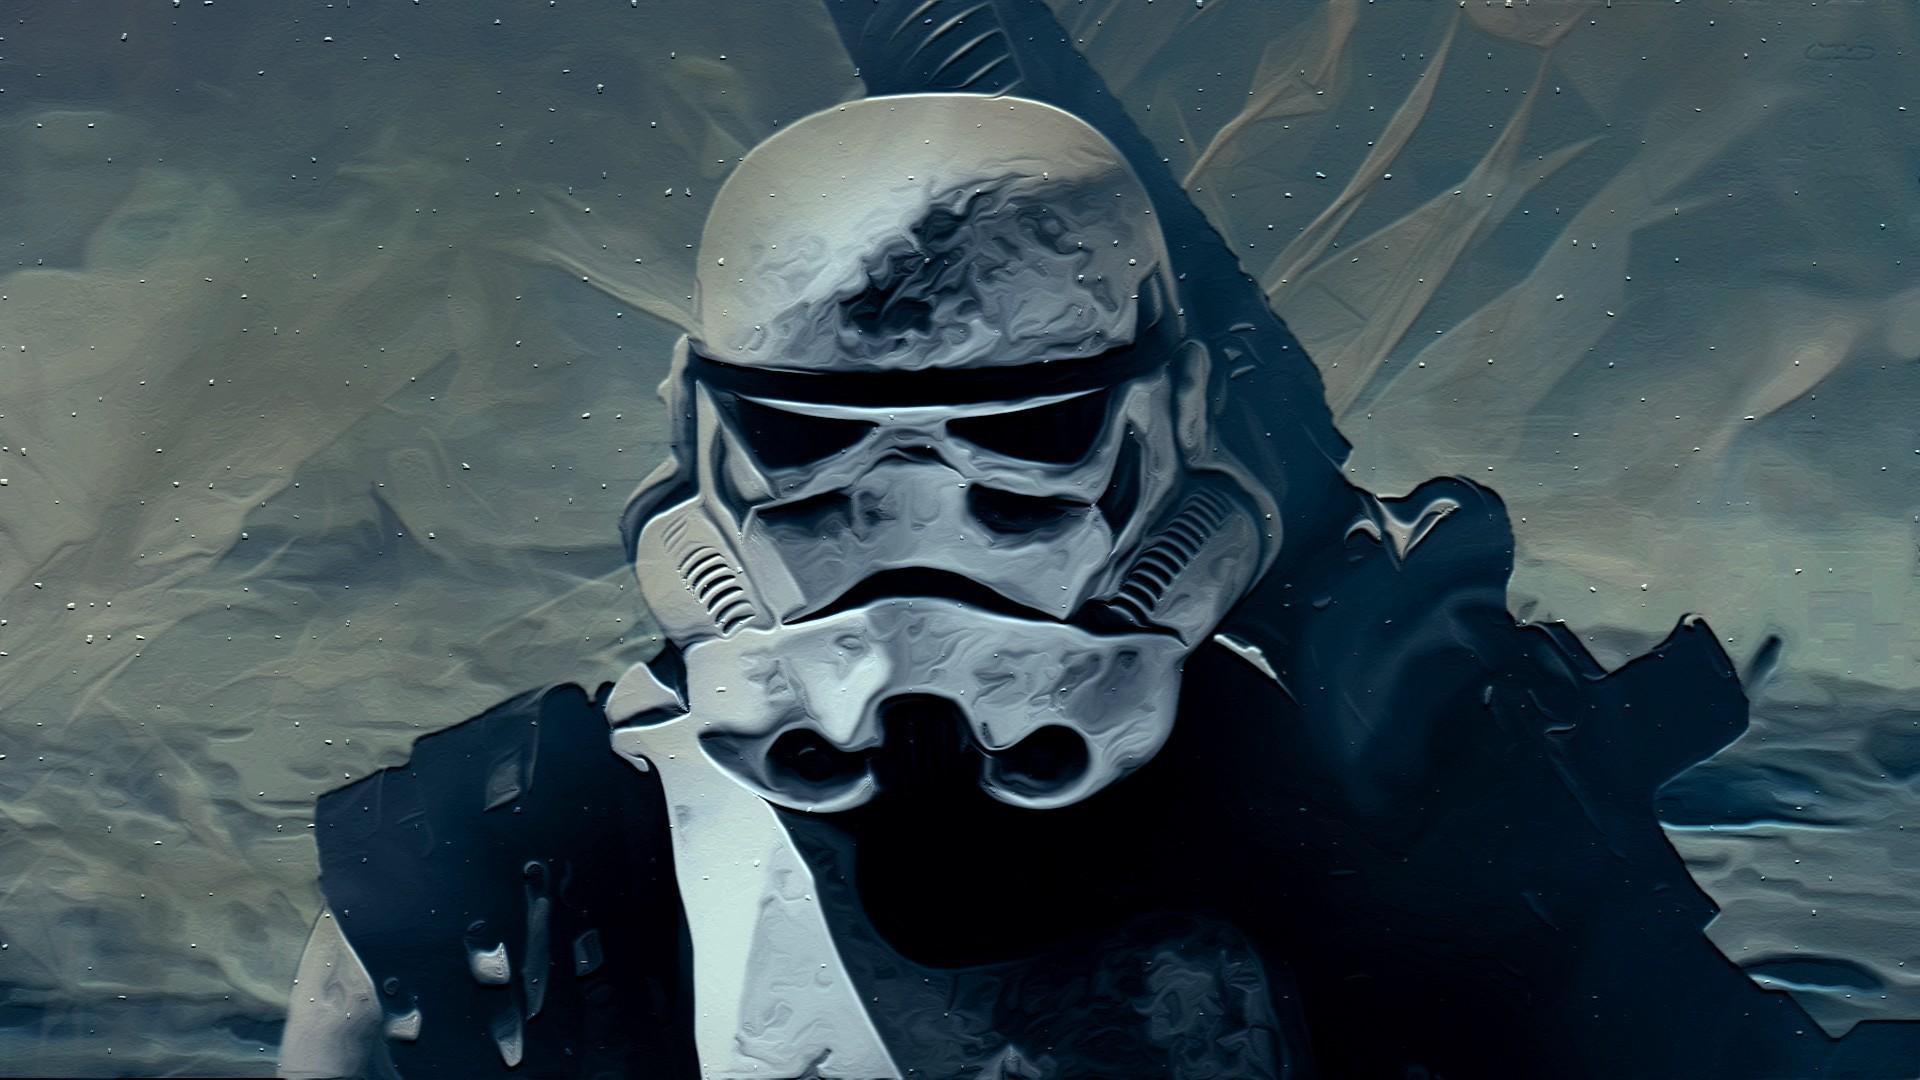 Stormtrooper High Definition